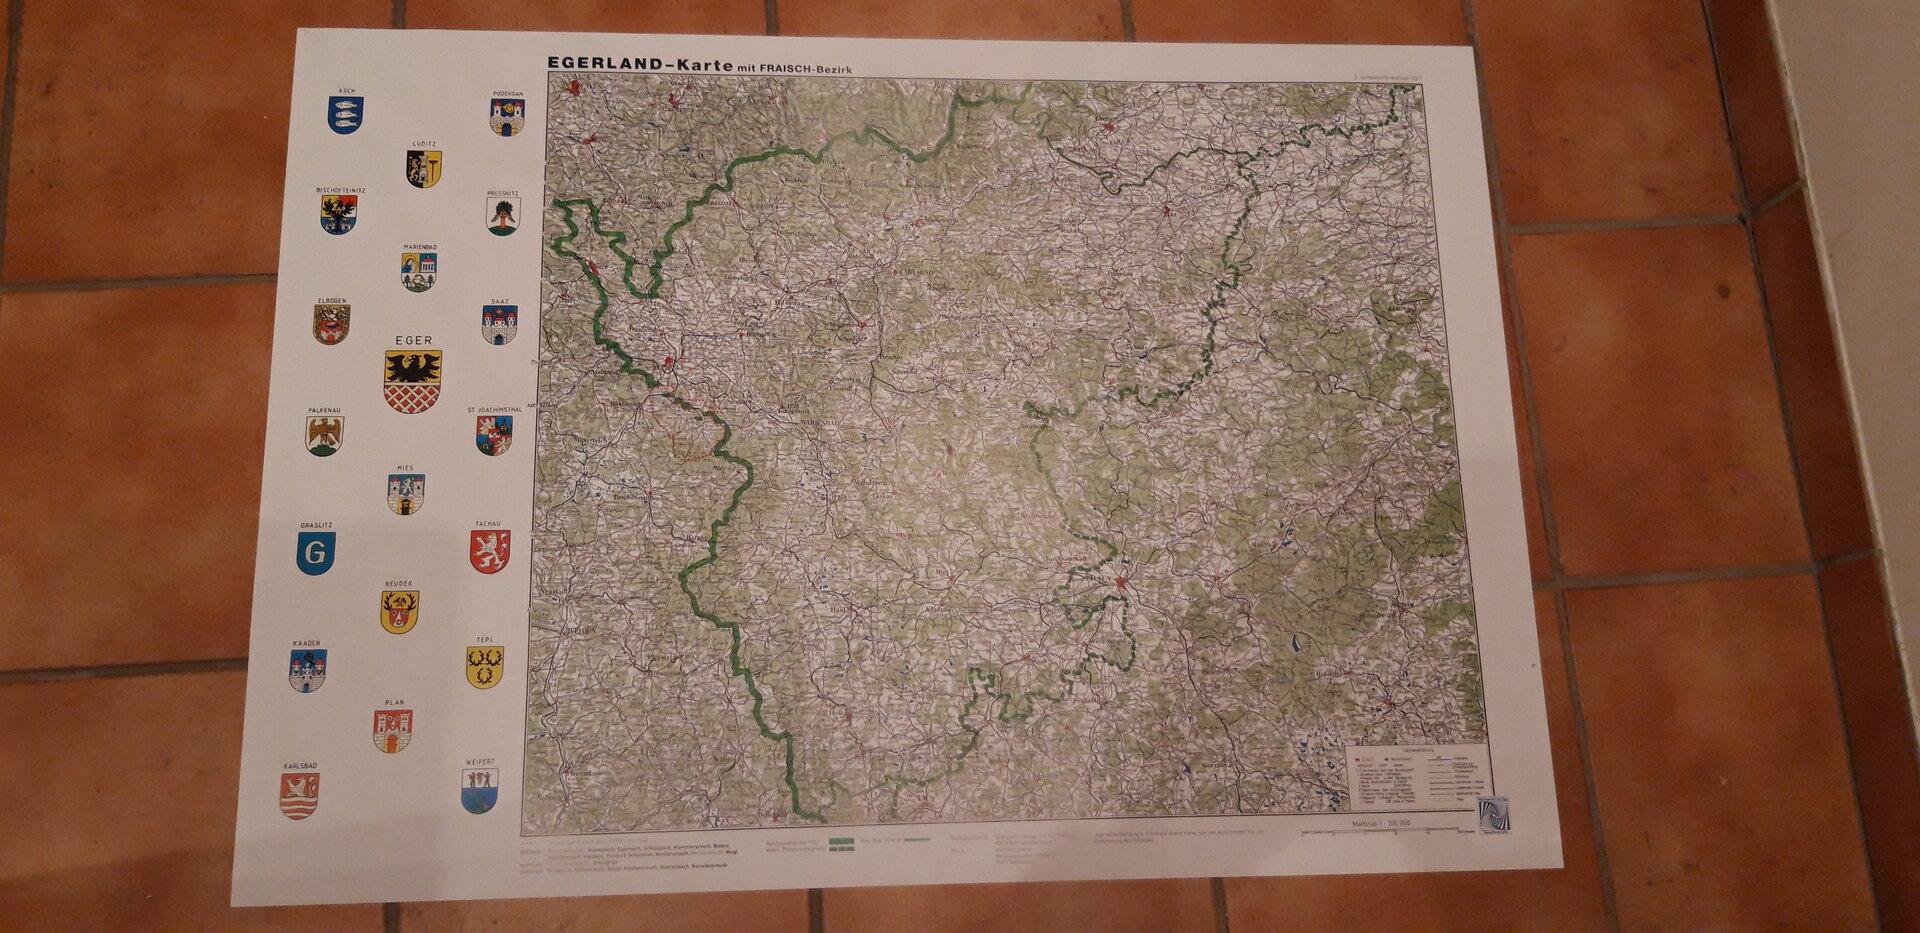 Egerlandkarte